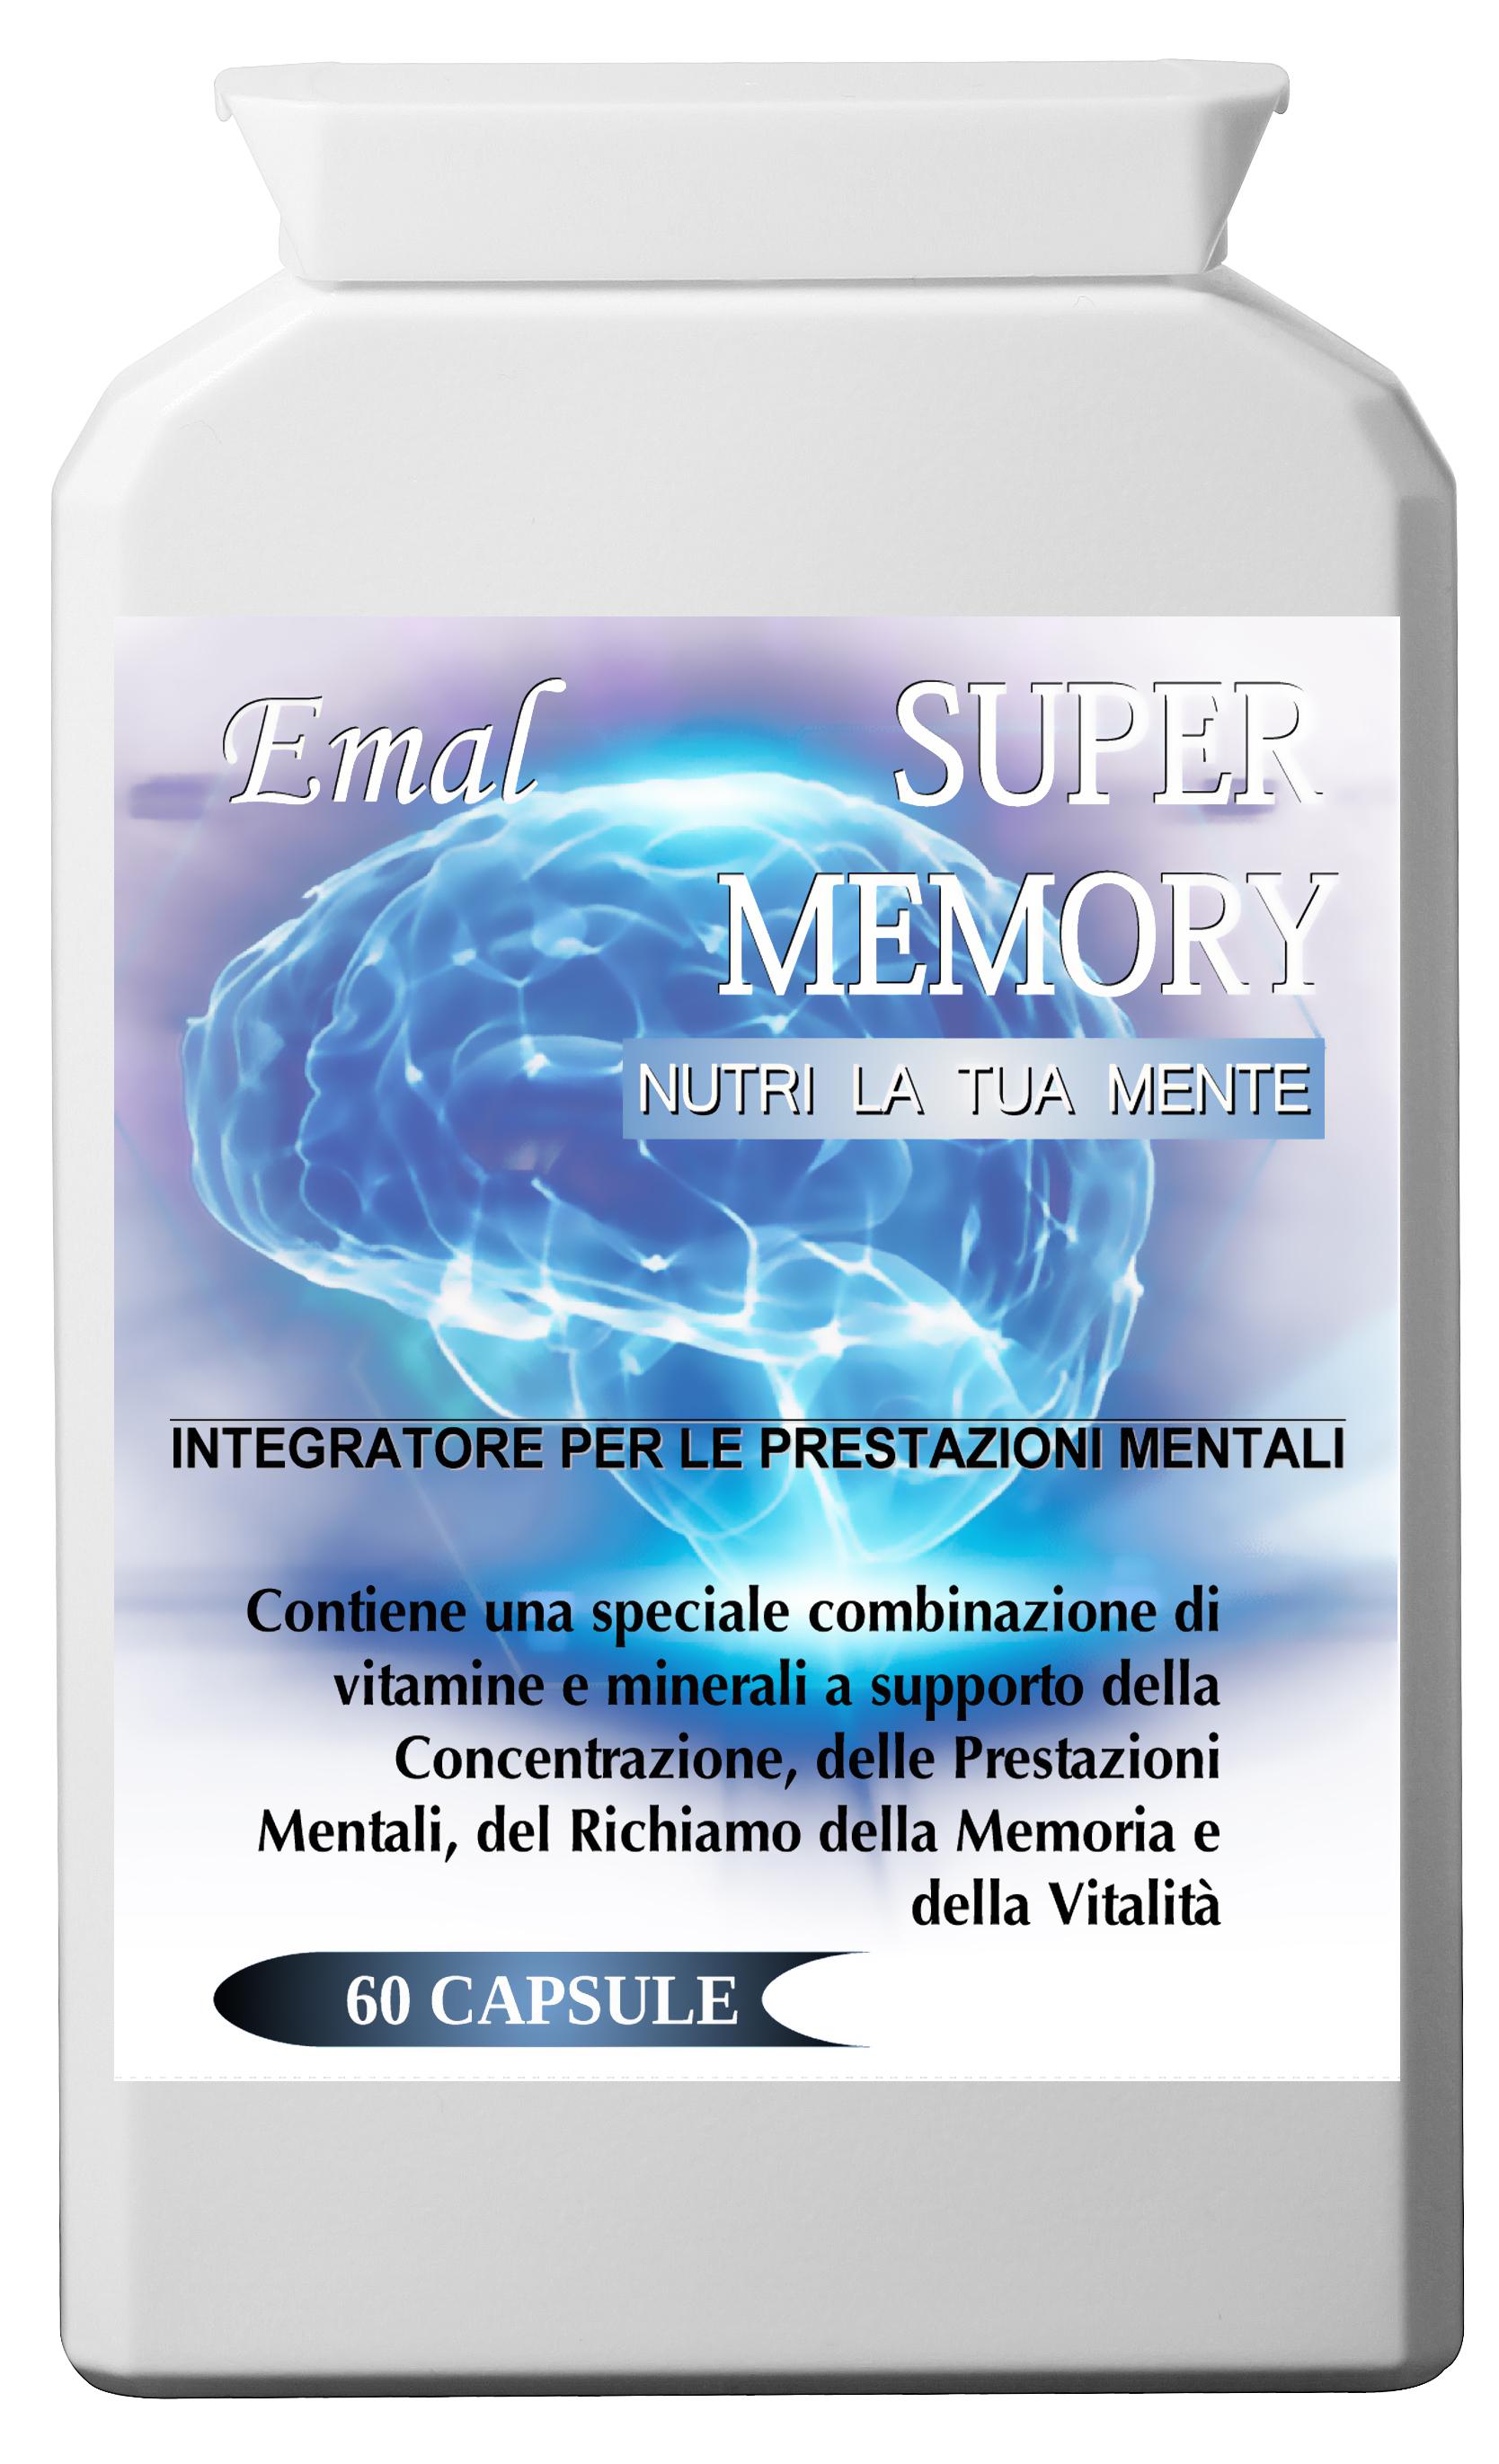 Emal Super Memory. Supplemento Nootropico Naturale 60 capsule